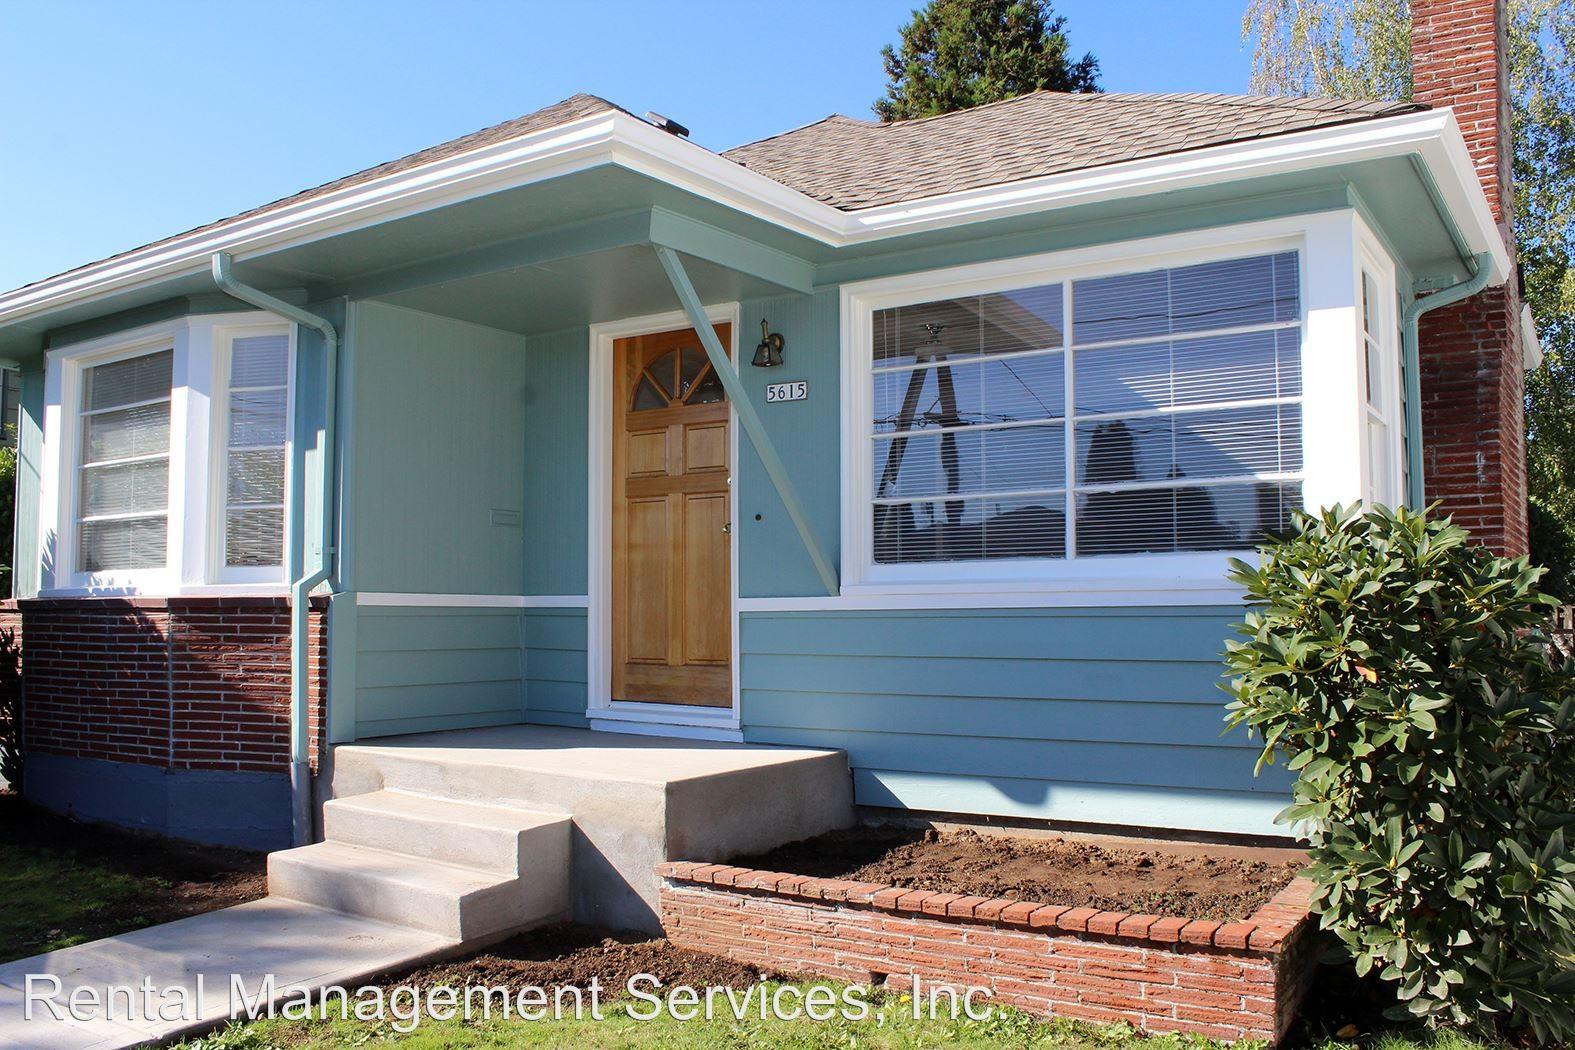 5615 Ne 38th Ave Portland Or 97211 2 Bedroom Apartment For Rent Padmapper